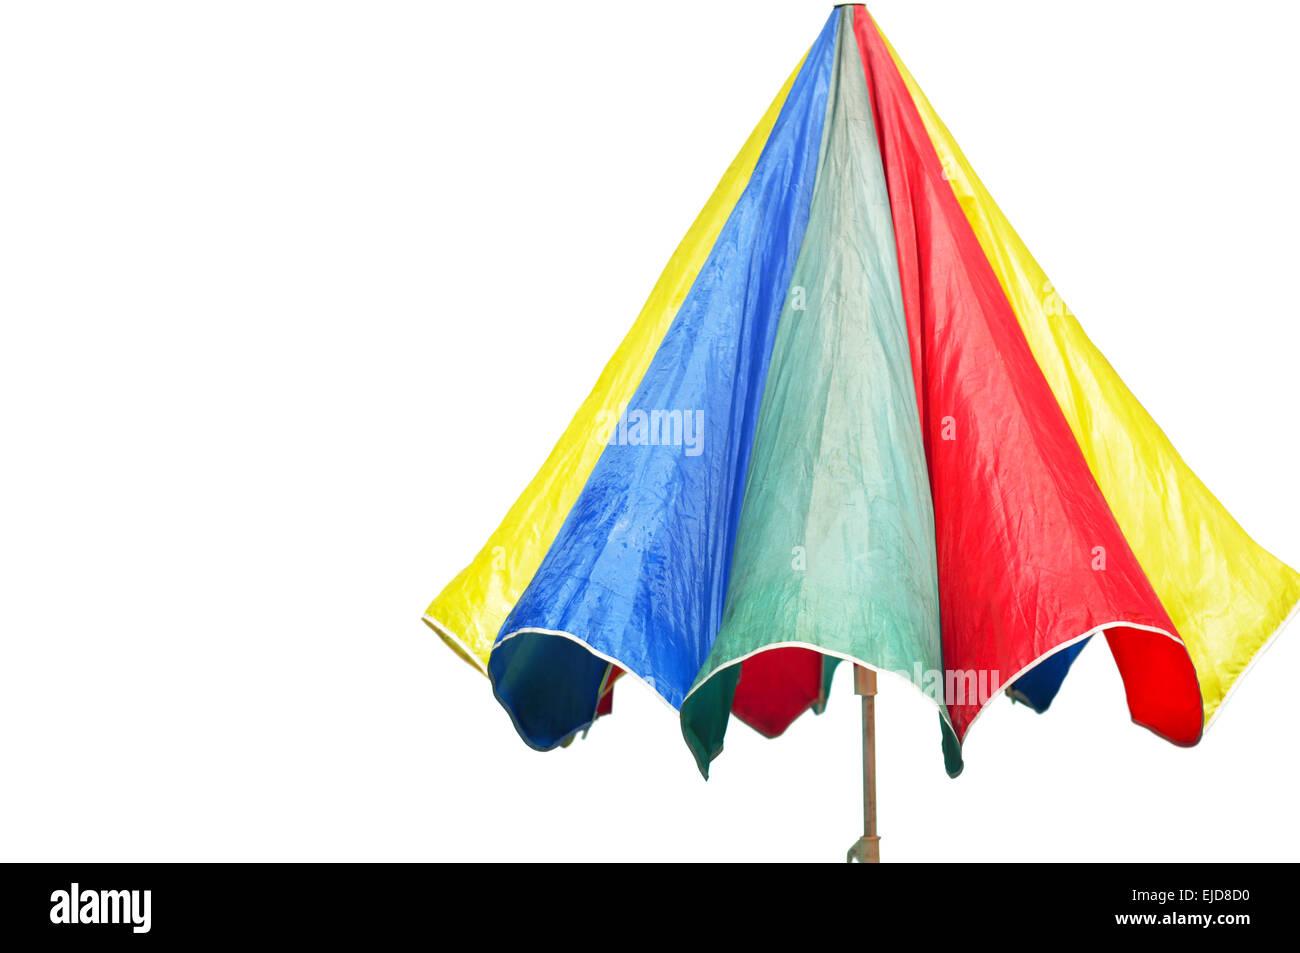 Beach umbrella isolated in white - Stock Image